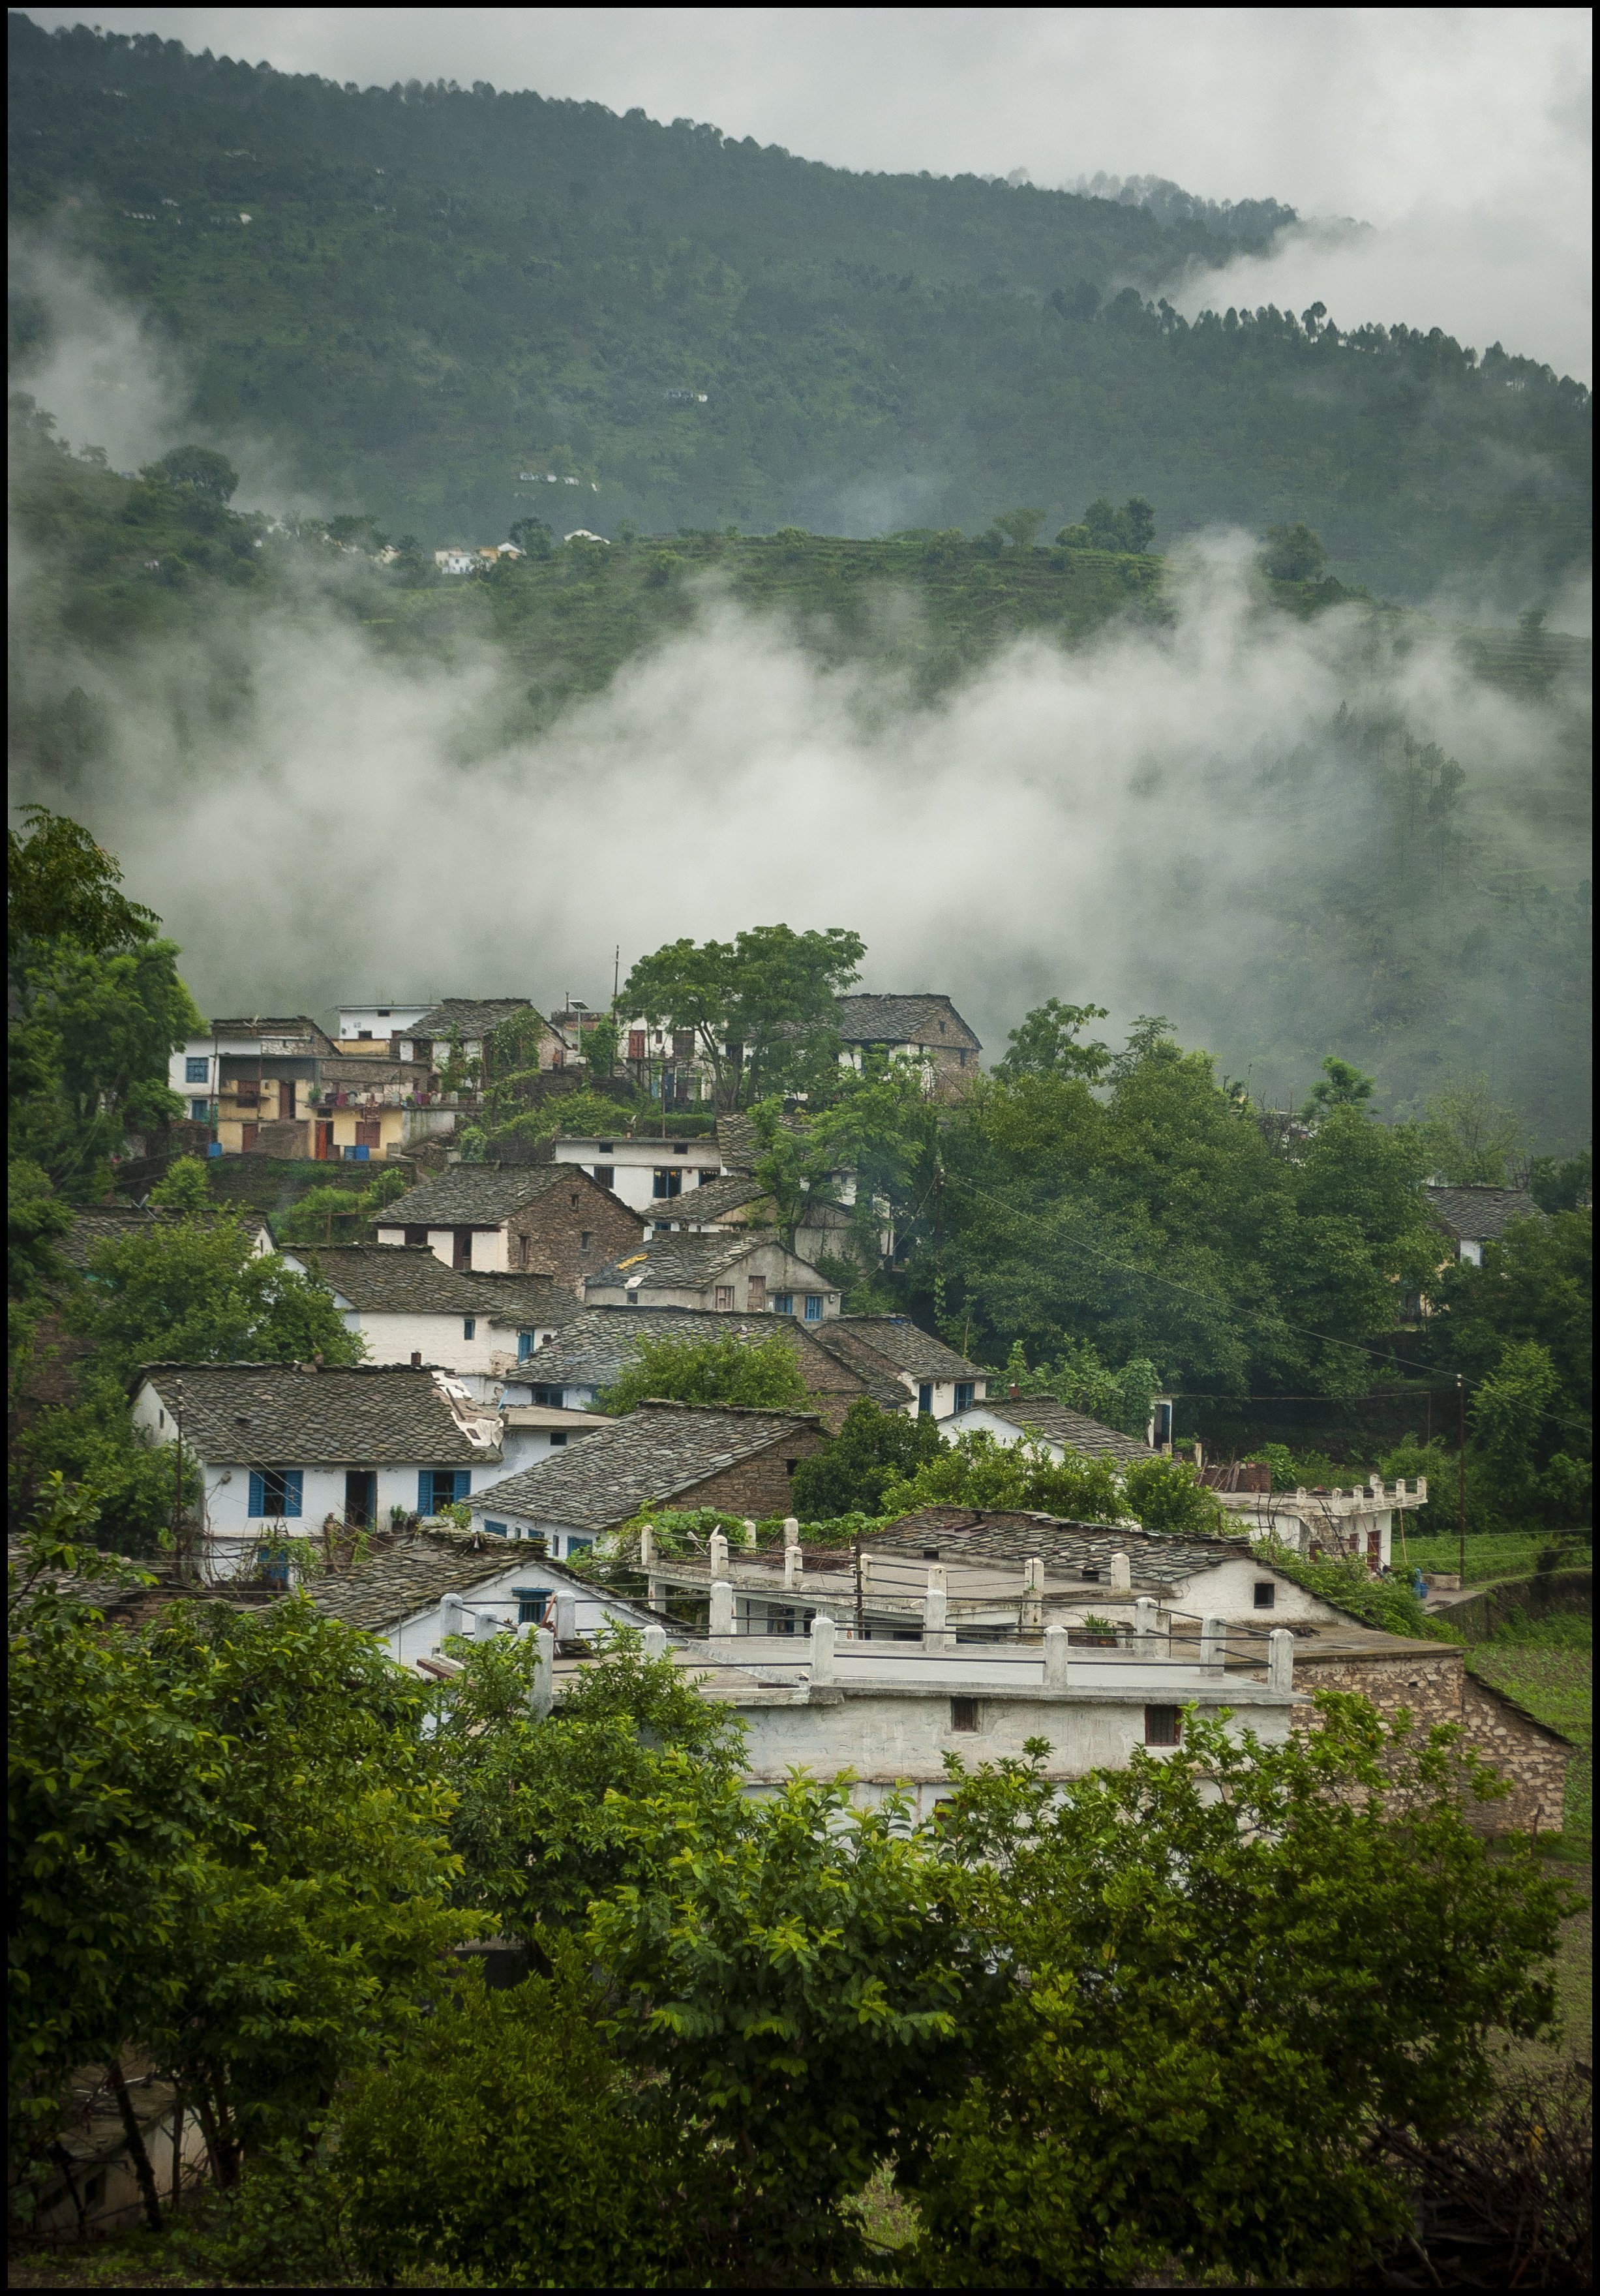 mountain abodes, Kothiyan village, Kumaun Himalaya, Uttarakhand, India